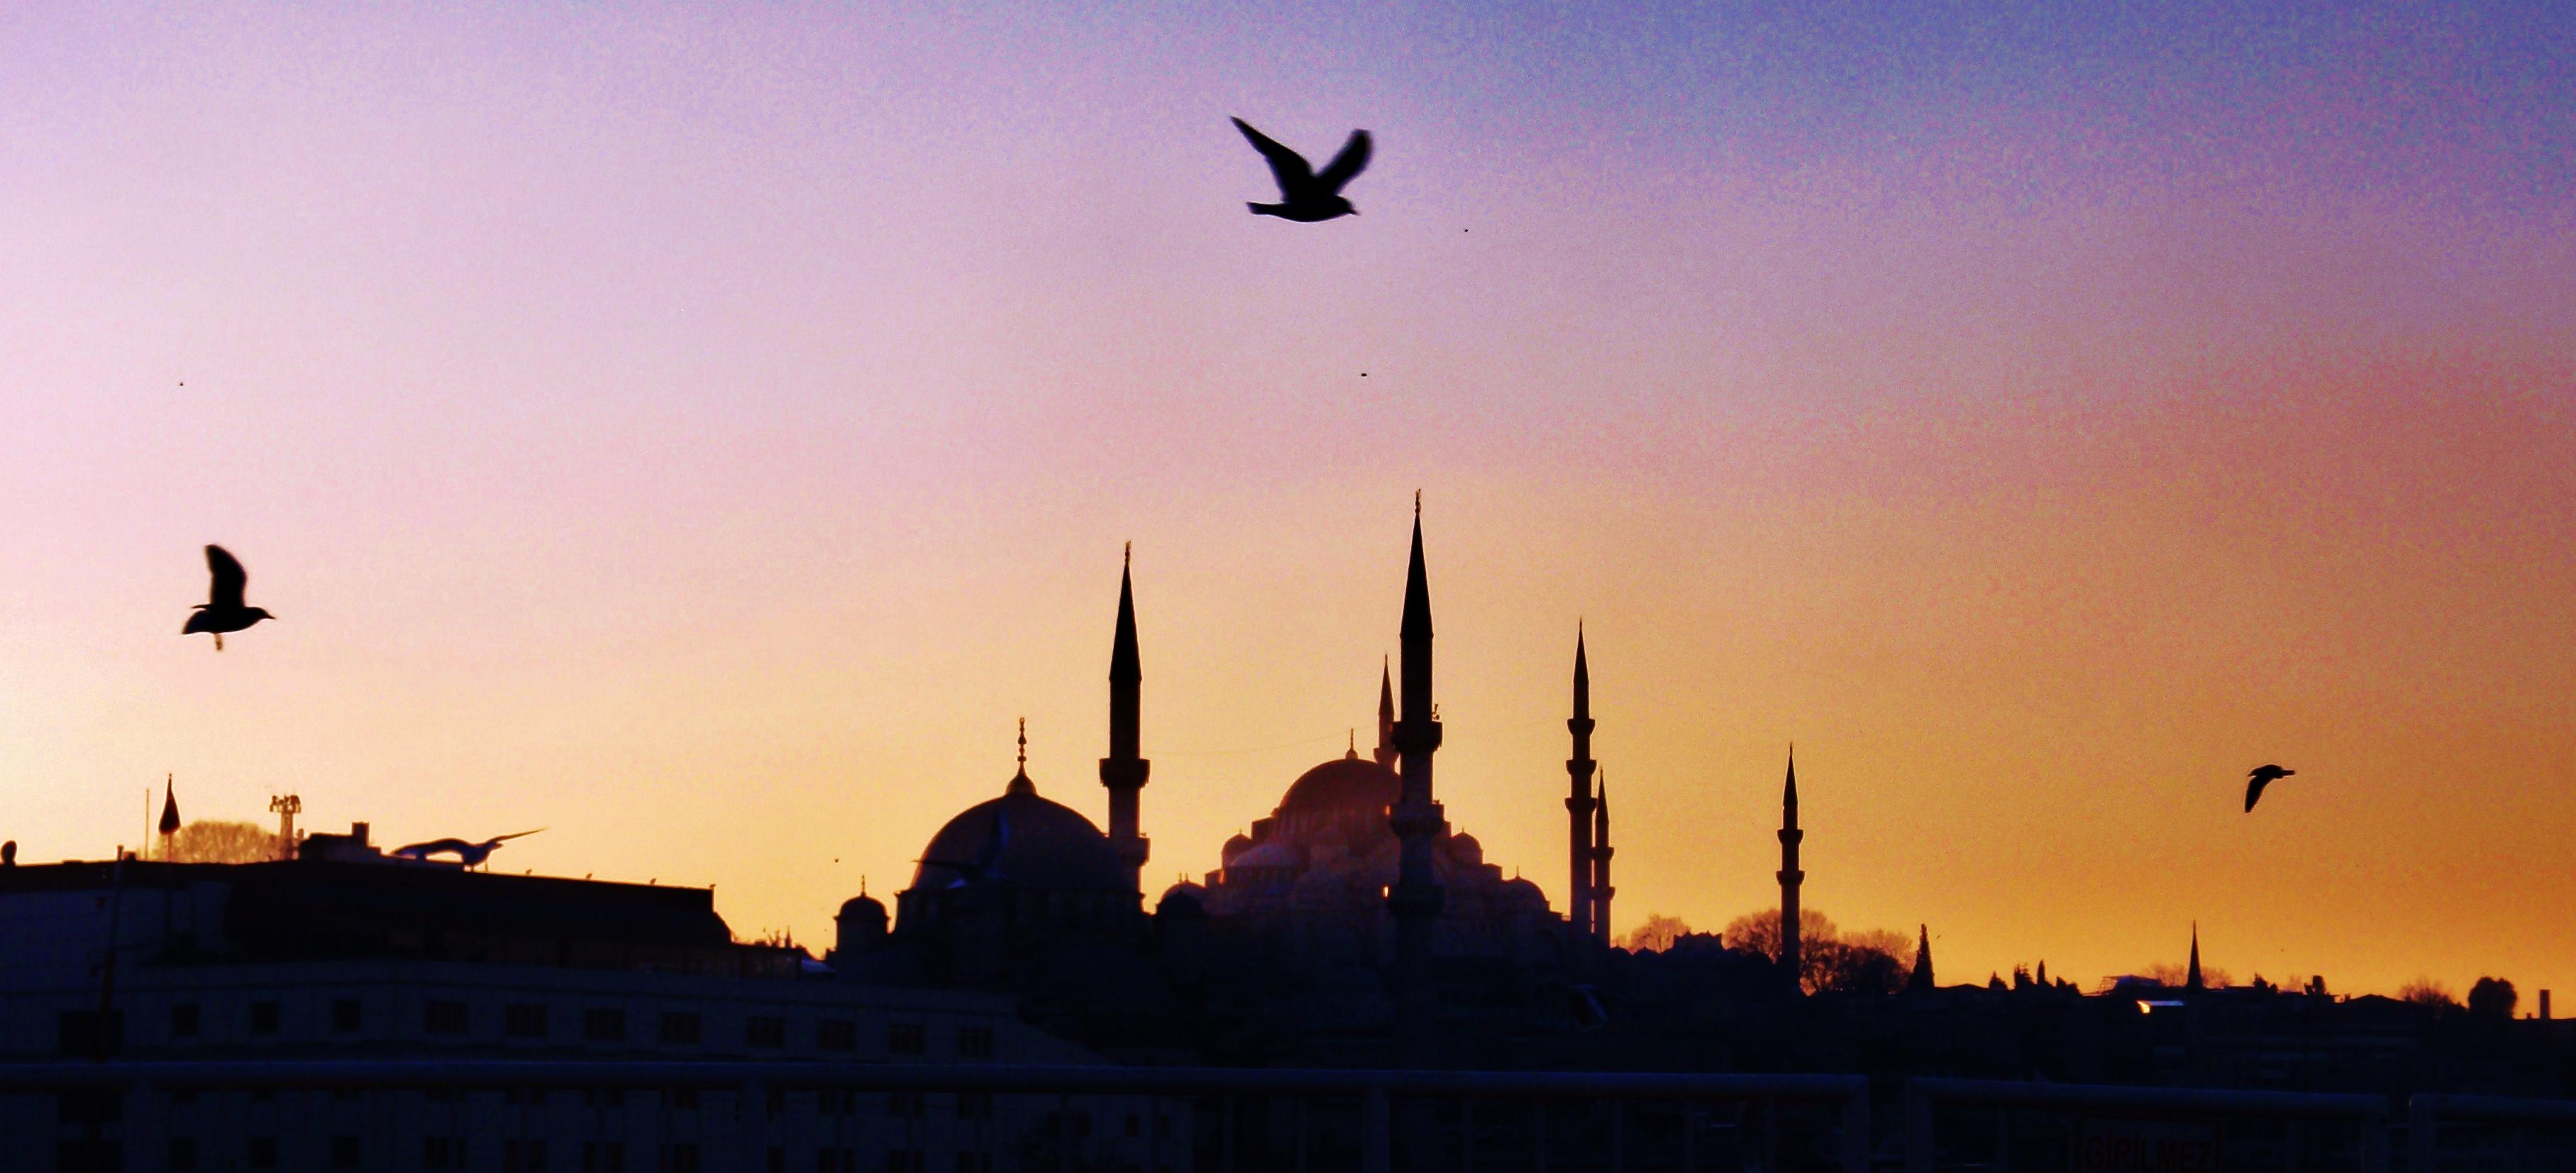 wandtattoo istanbul skyline pin kiz kulesi wandtattoo